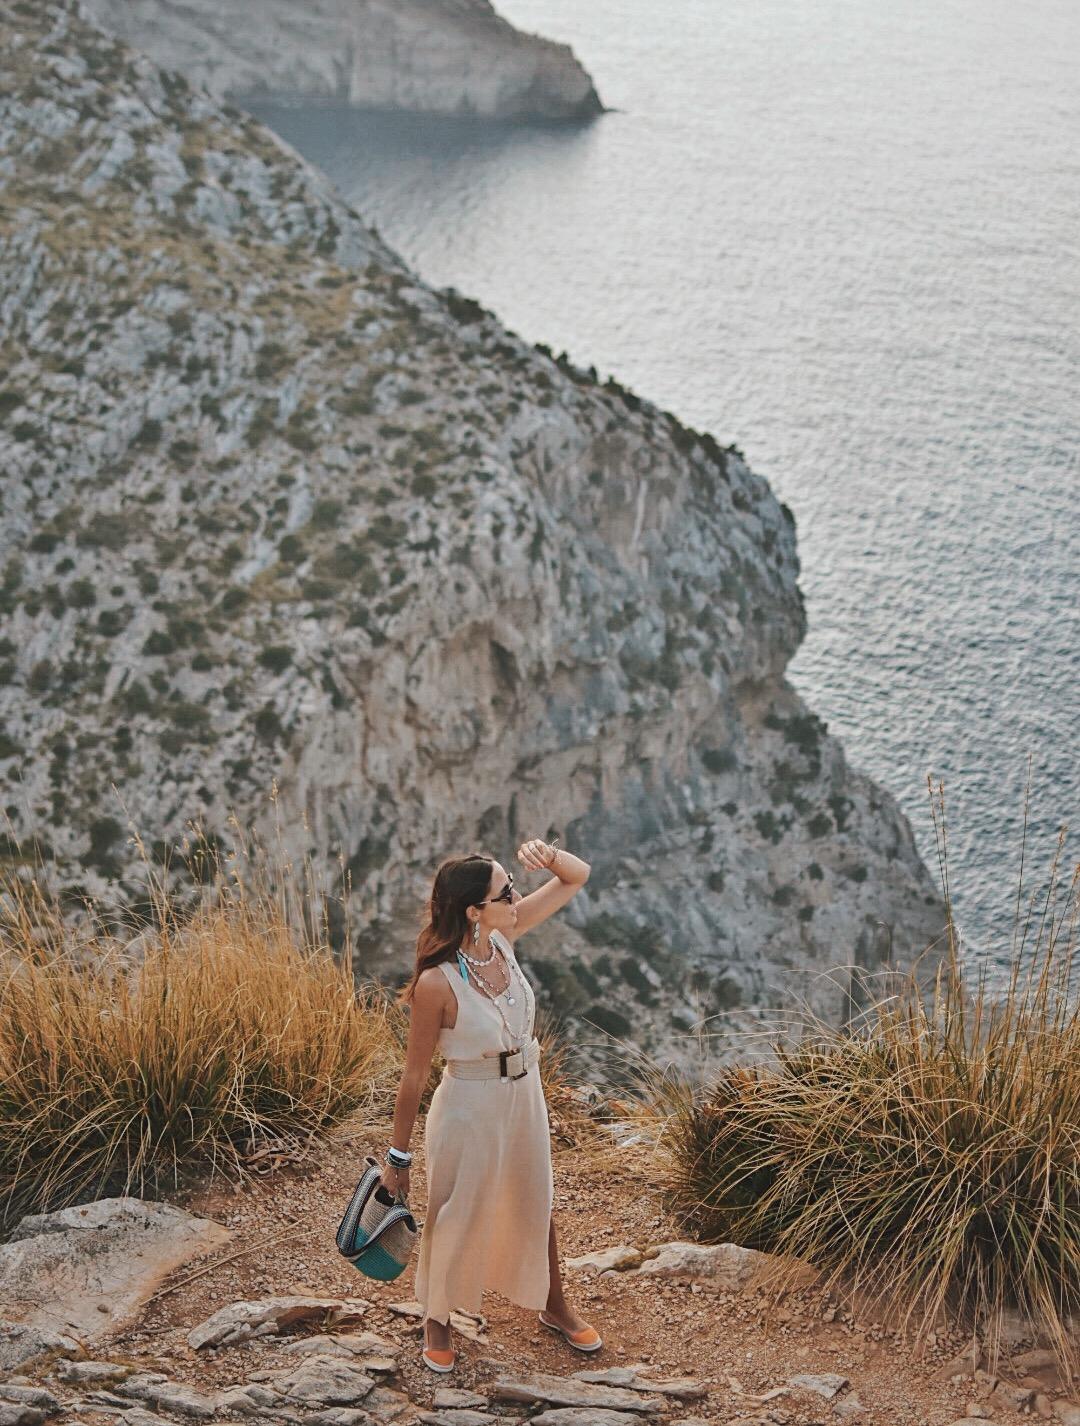 10-el-blog-de-silvia-vestido-beige-mallorca